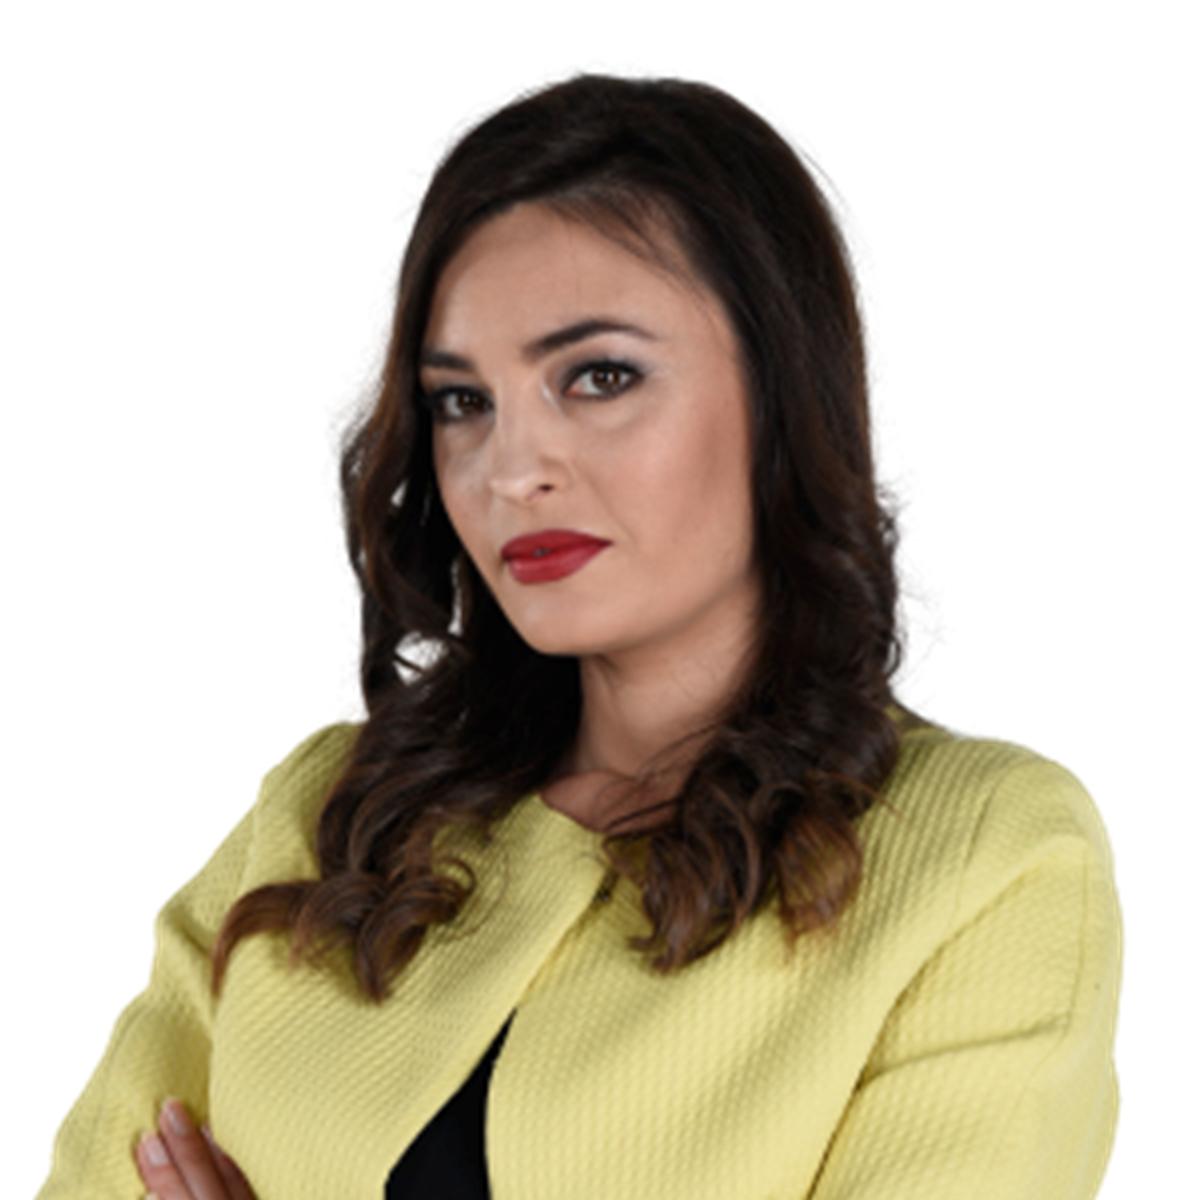 Jelena Plavanski